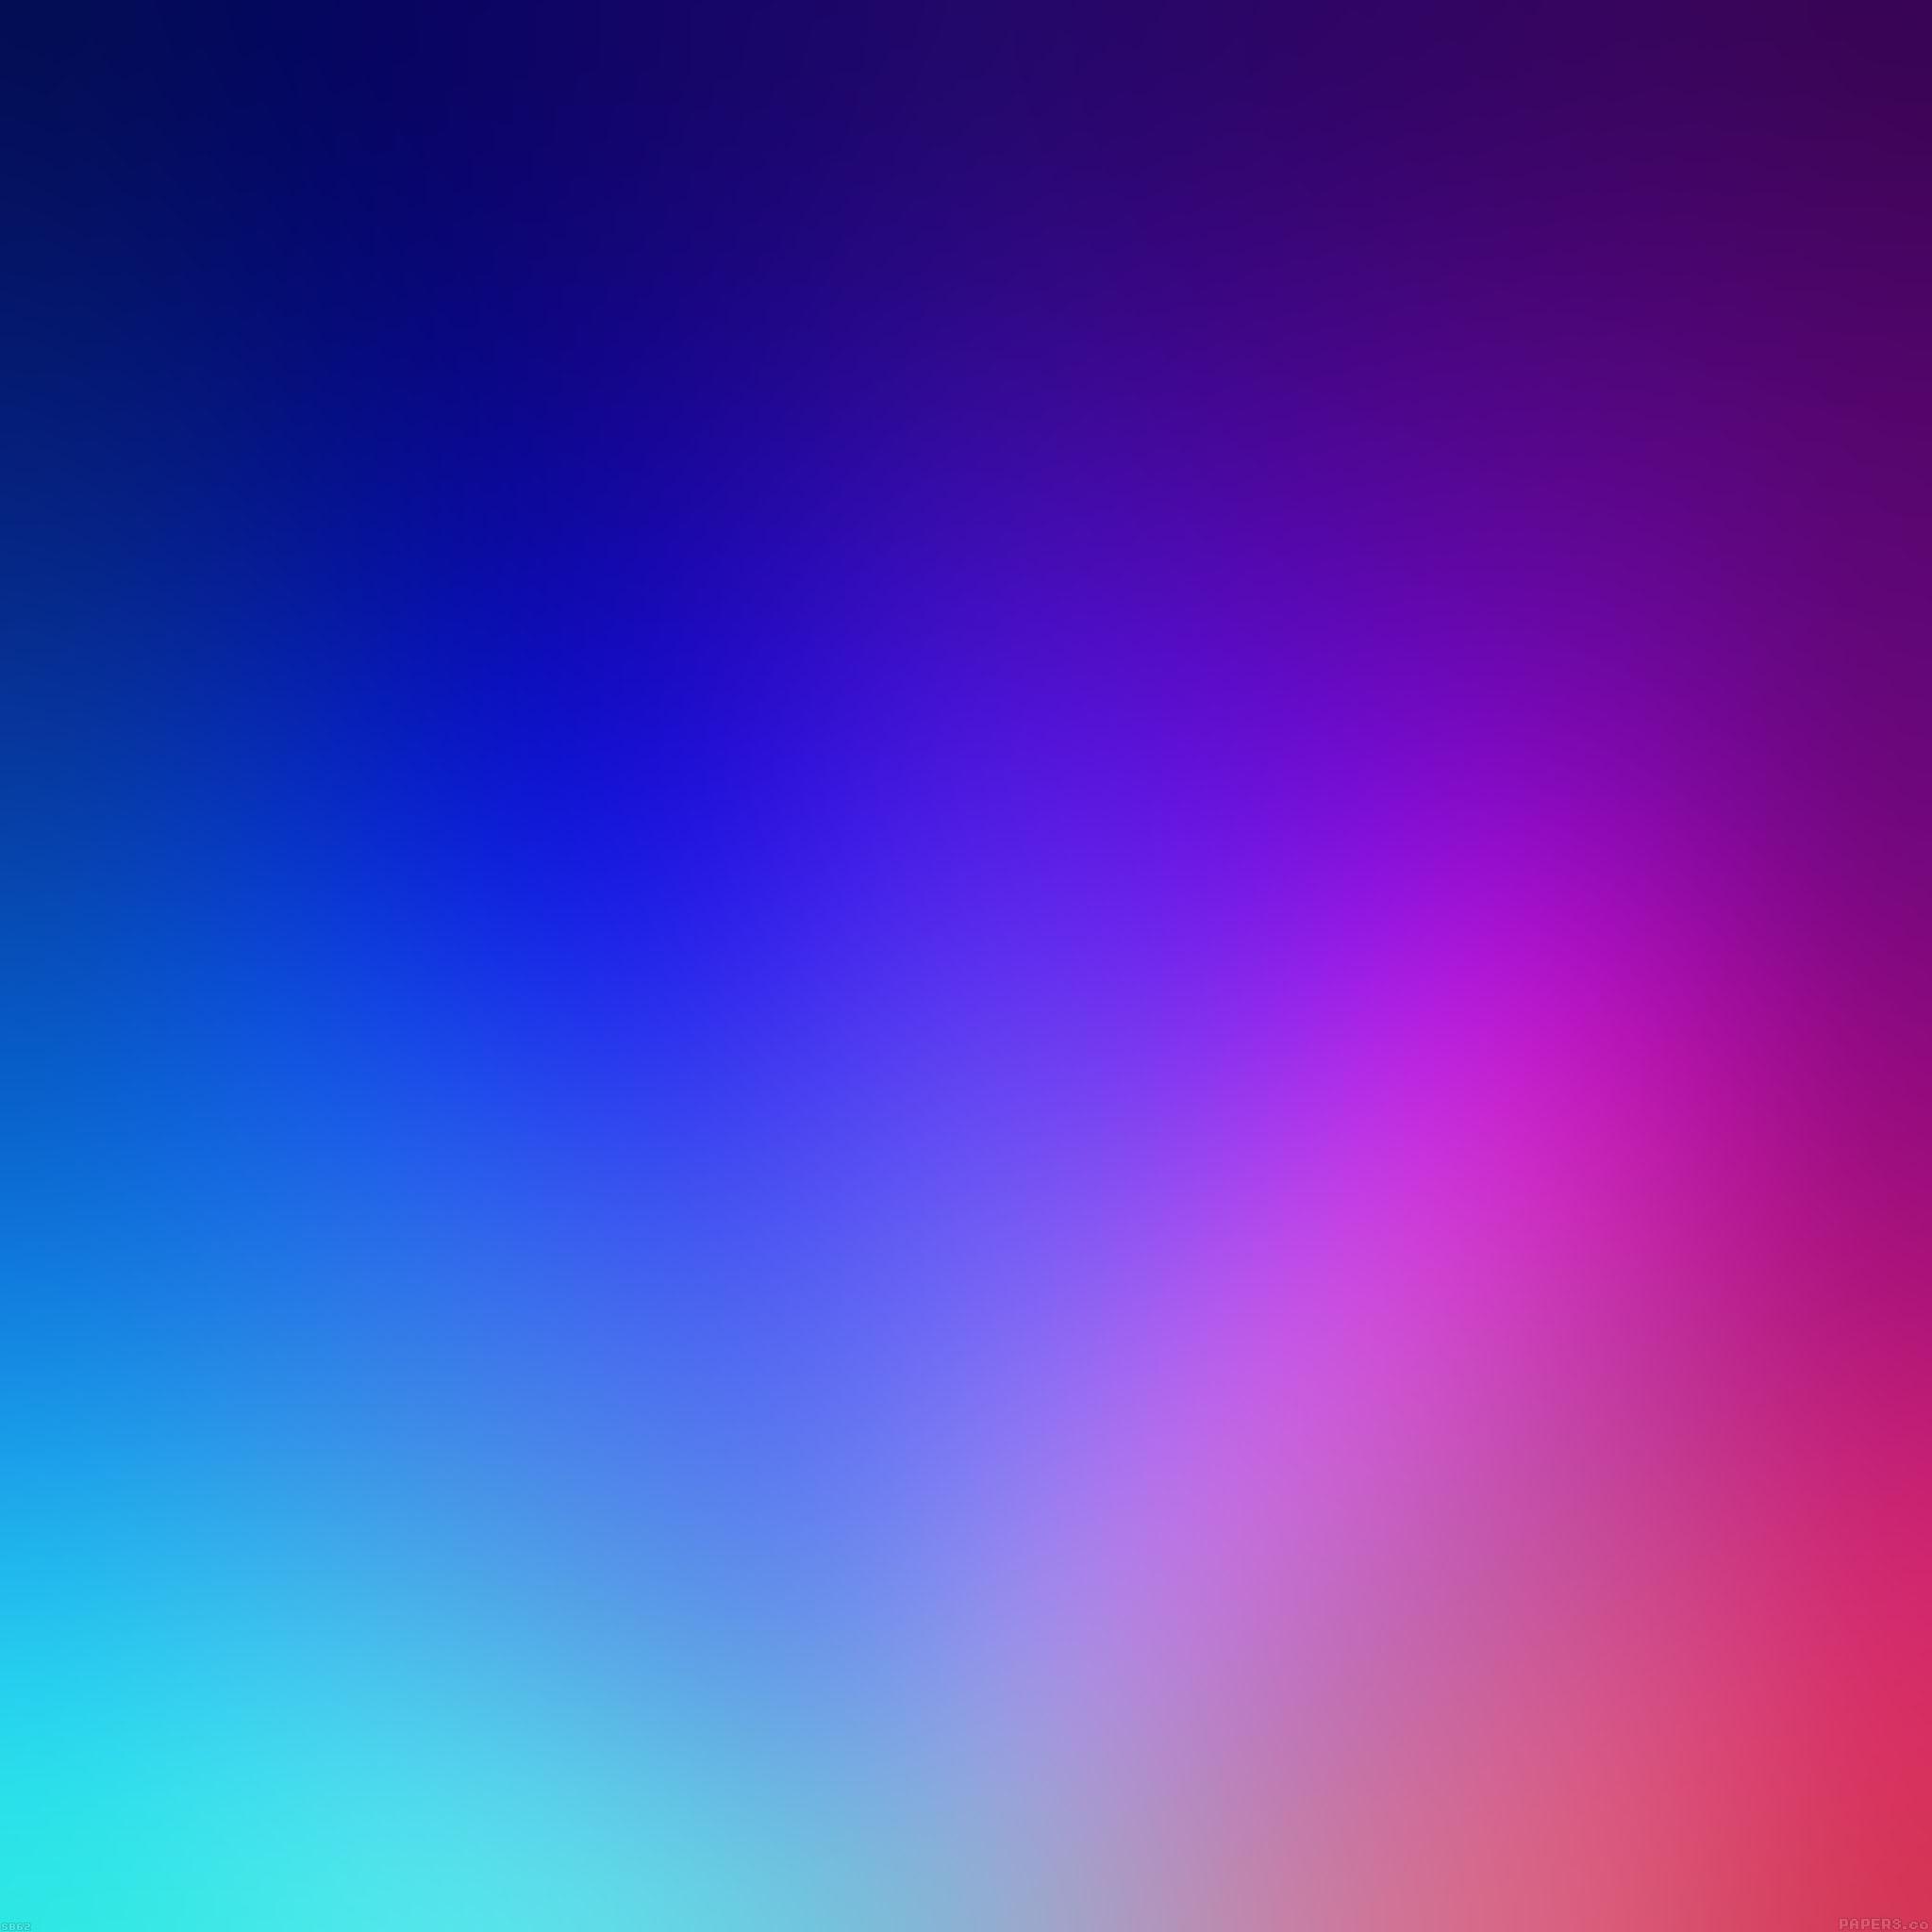 Fall Iphone 5 Wallpaper Freeios7 Sb62 Wallpaper Rainbow Blue Lights Patterns